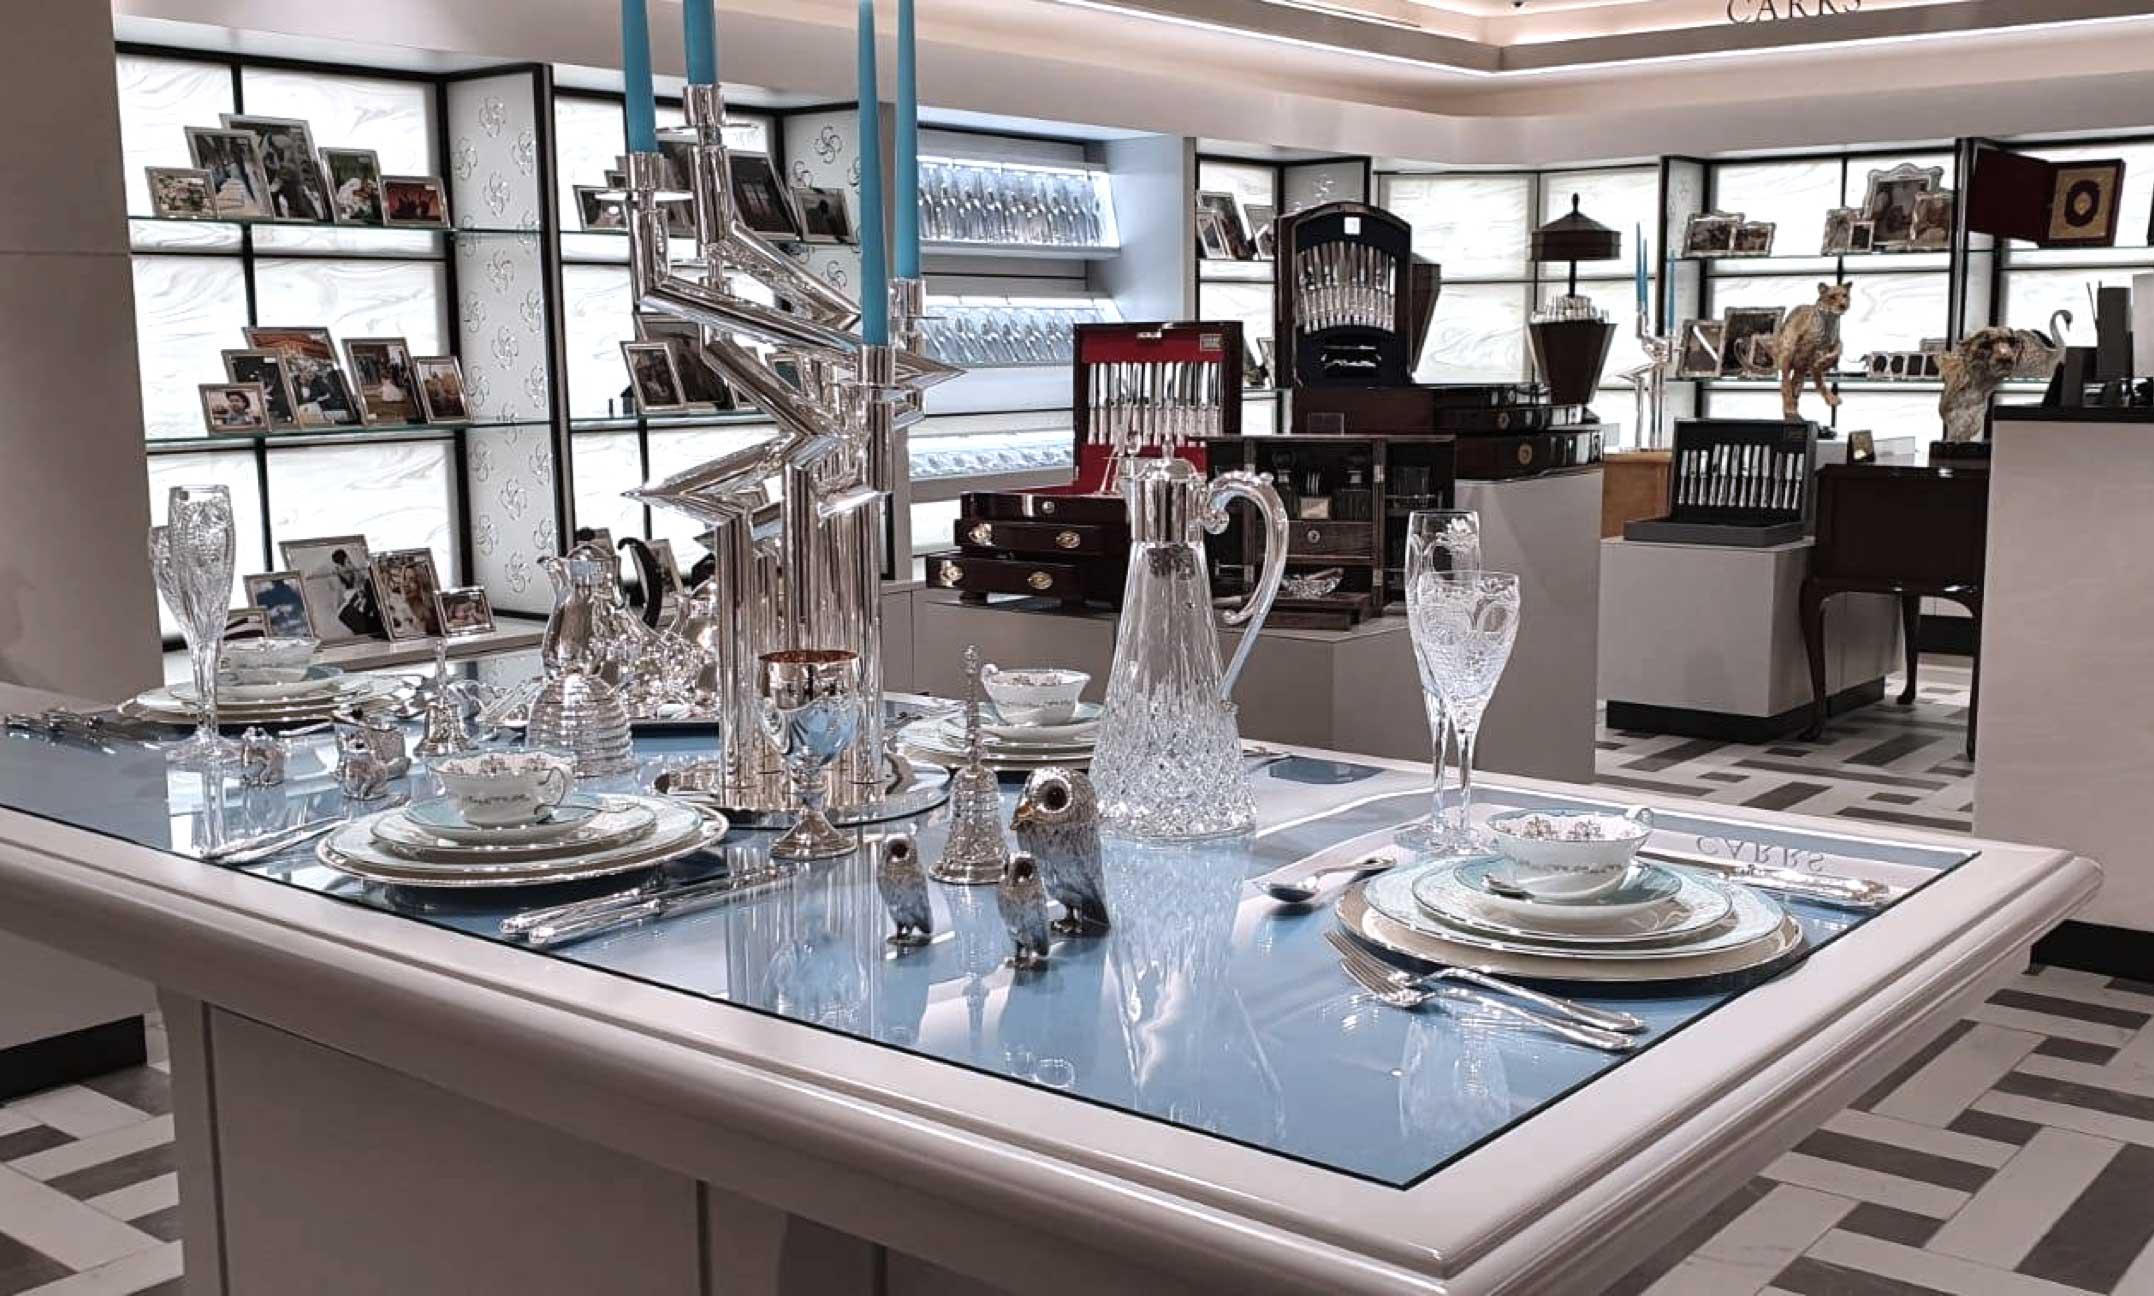 Carrs Silver showroom in Harrods, London